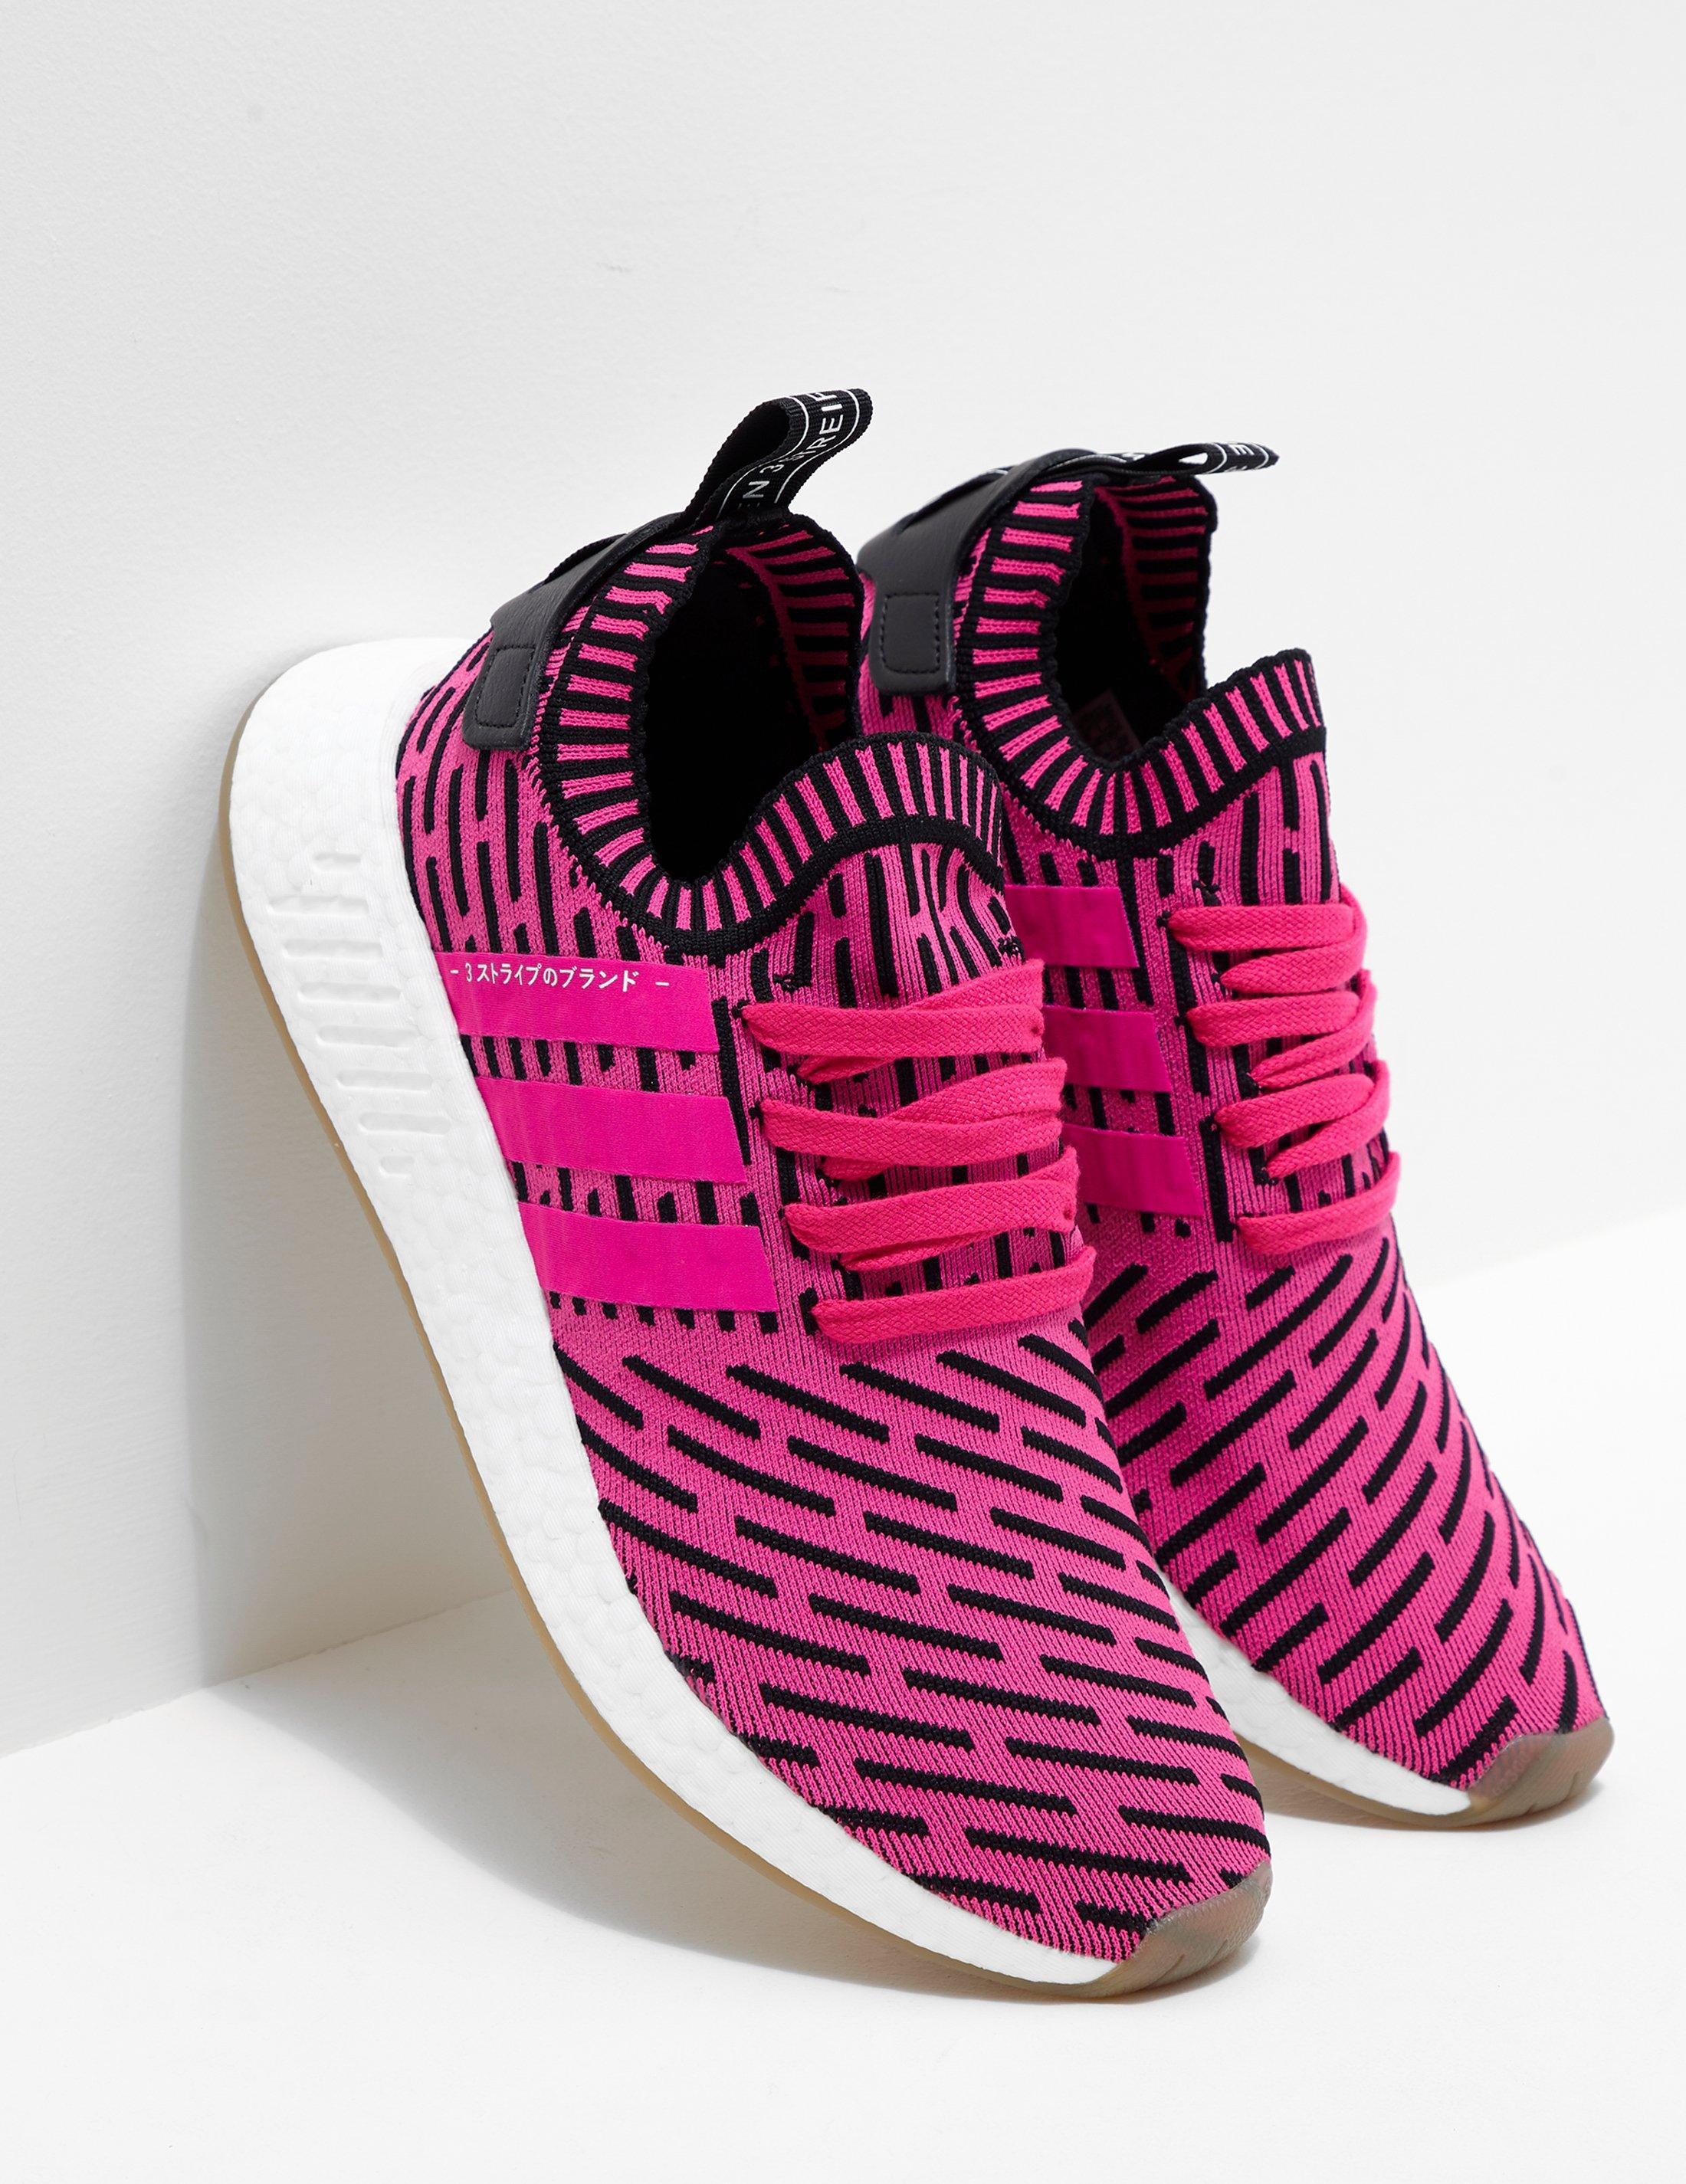 Lyst Adidas Originali Uomo Nmd R2 Primeknit / Bianco, Rosa, Rosa / Bianco